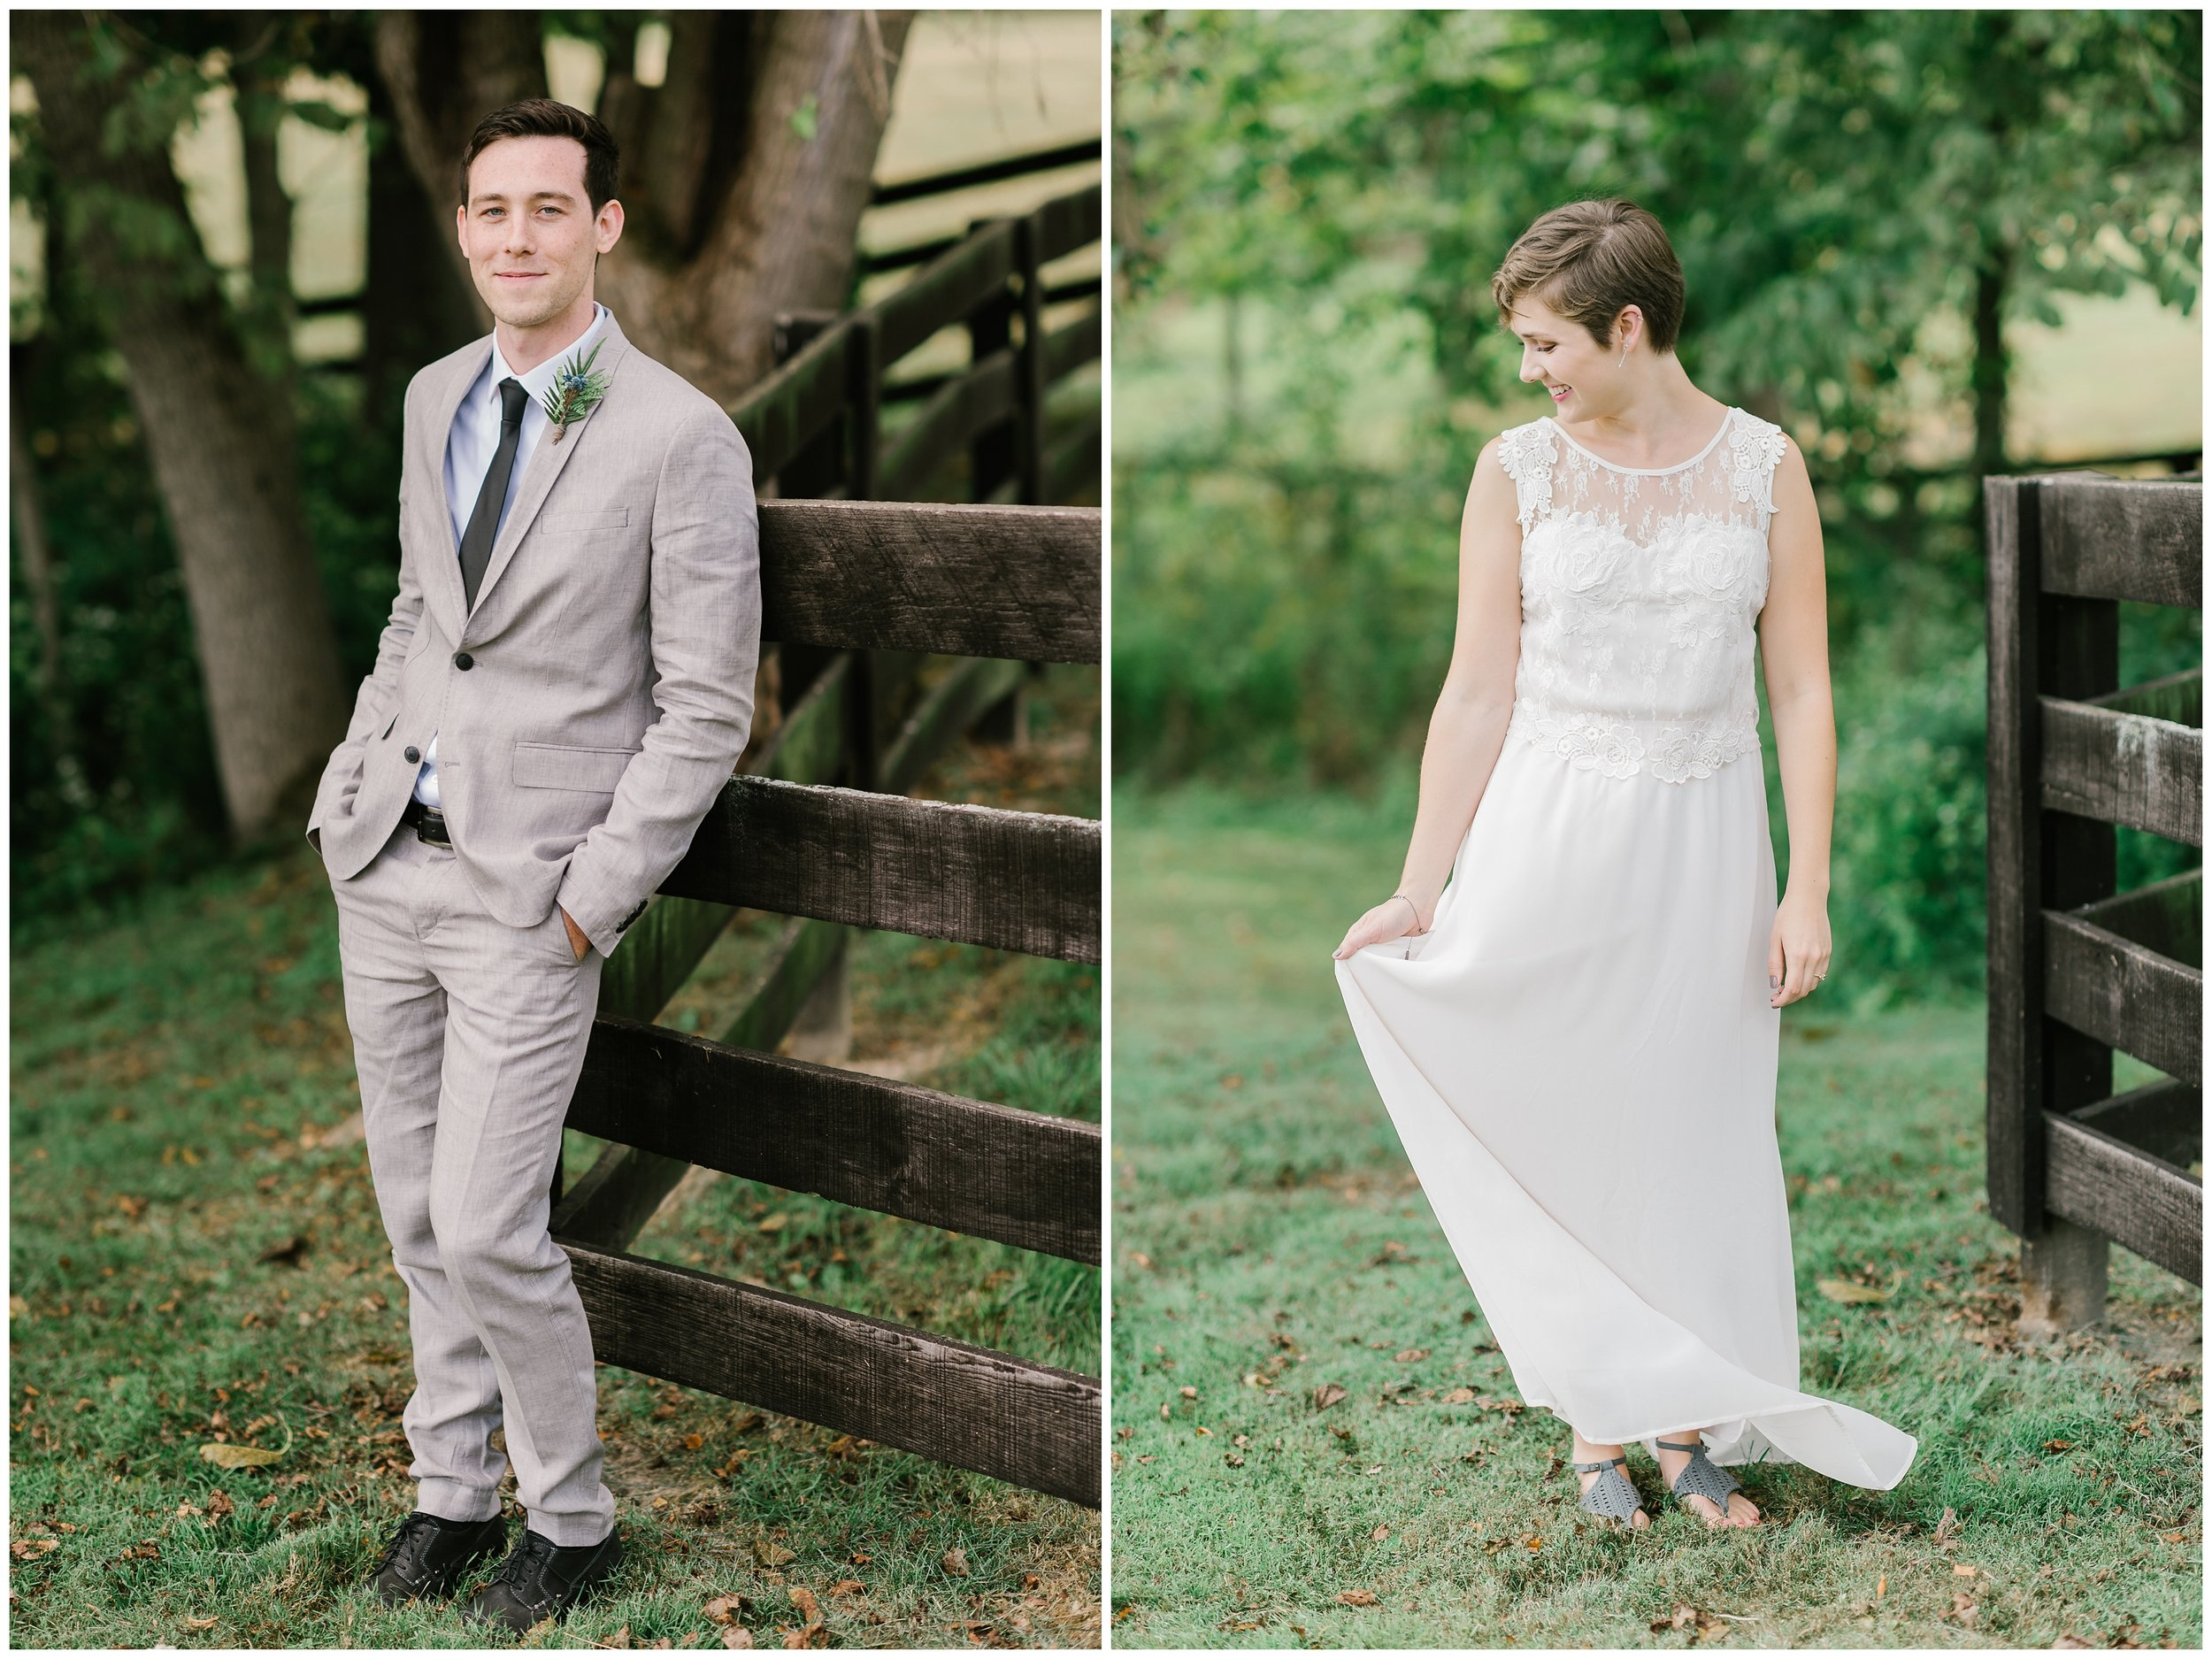 Rebecca_Shehorn_Photography_Indianapolis_Wedding_Photographer_7232.jpg